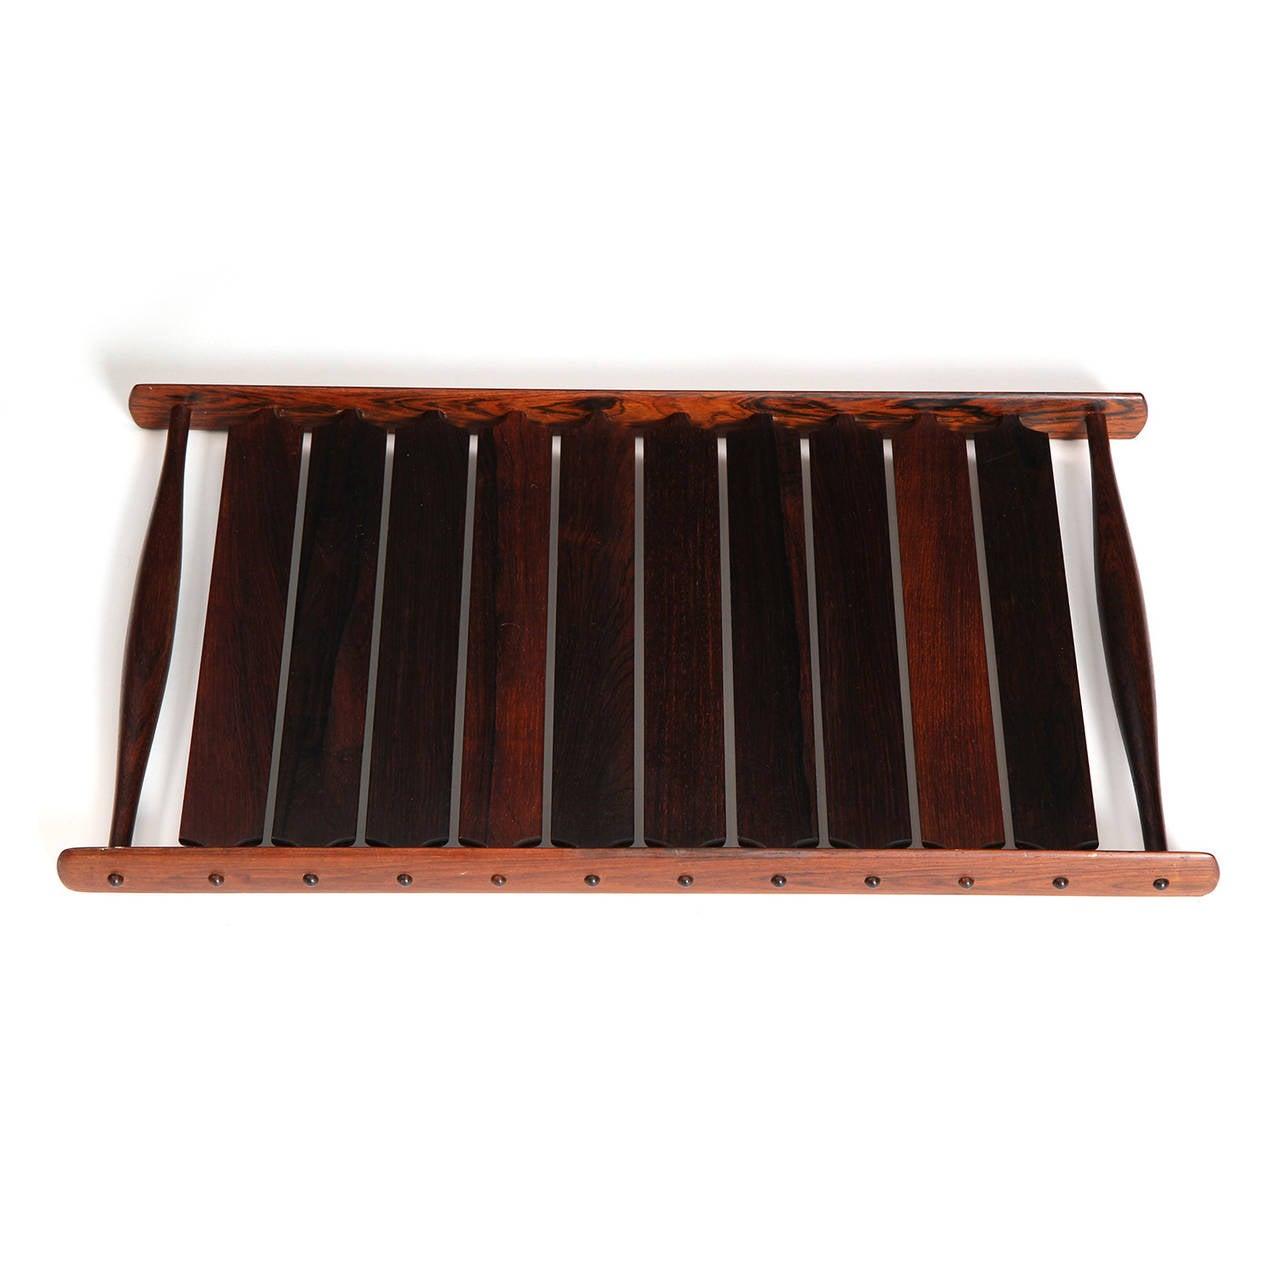 Scandinavian Modern Slatted Rosewood Tray by Jens Quistgaard For Sale